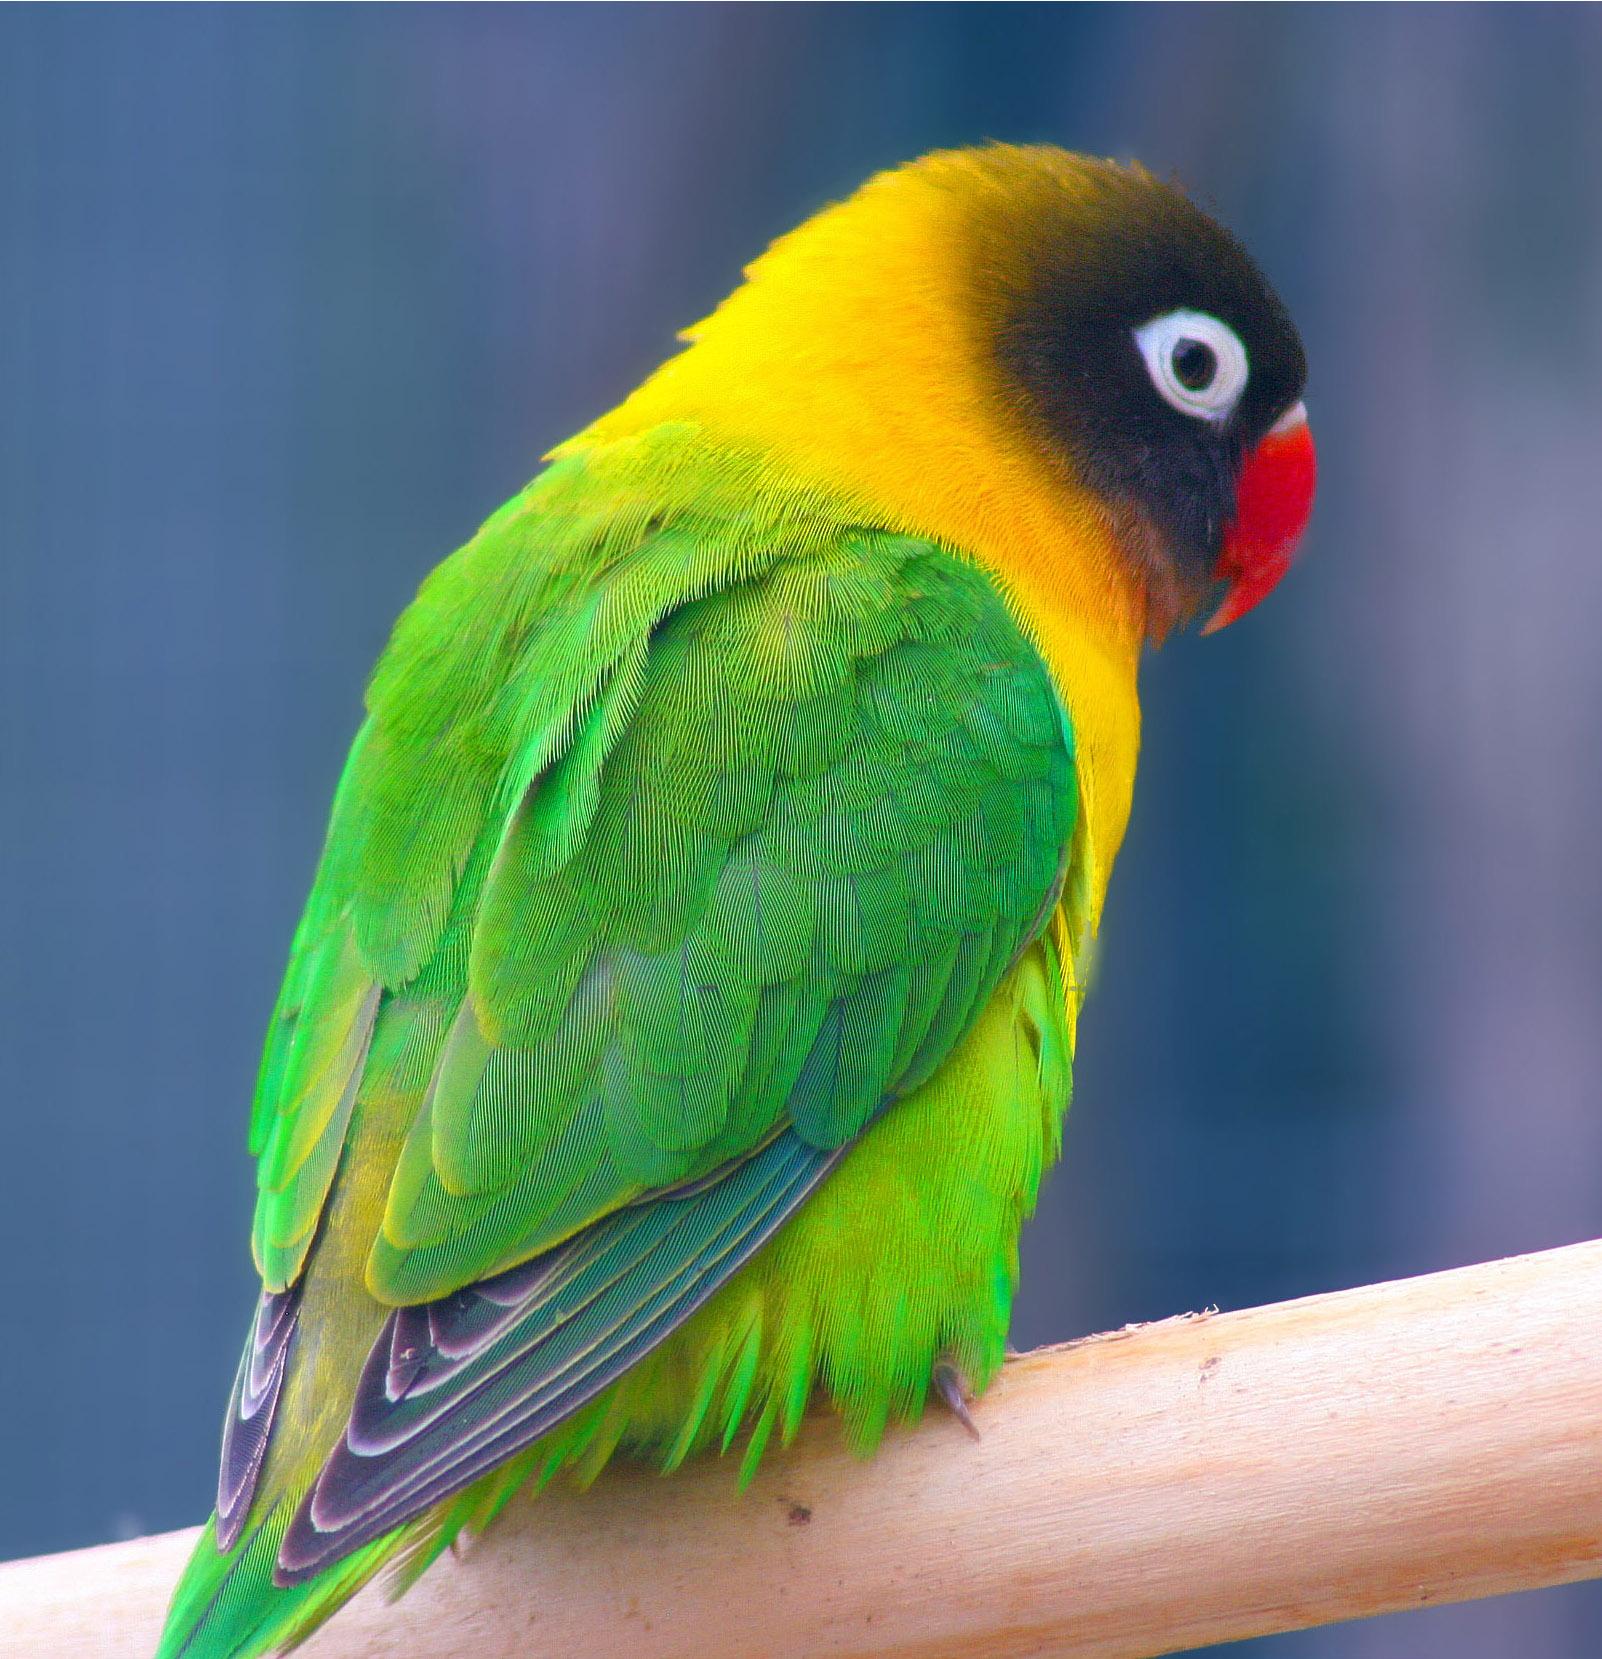 Loverbird